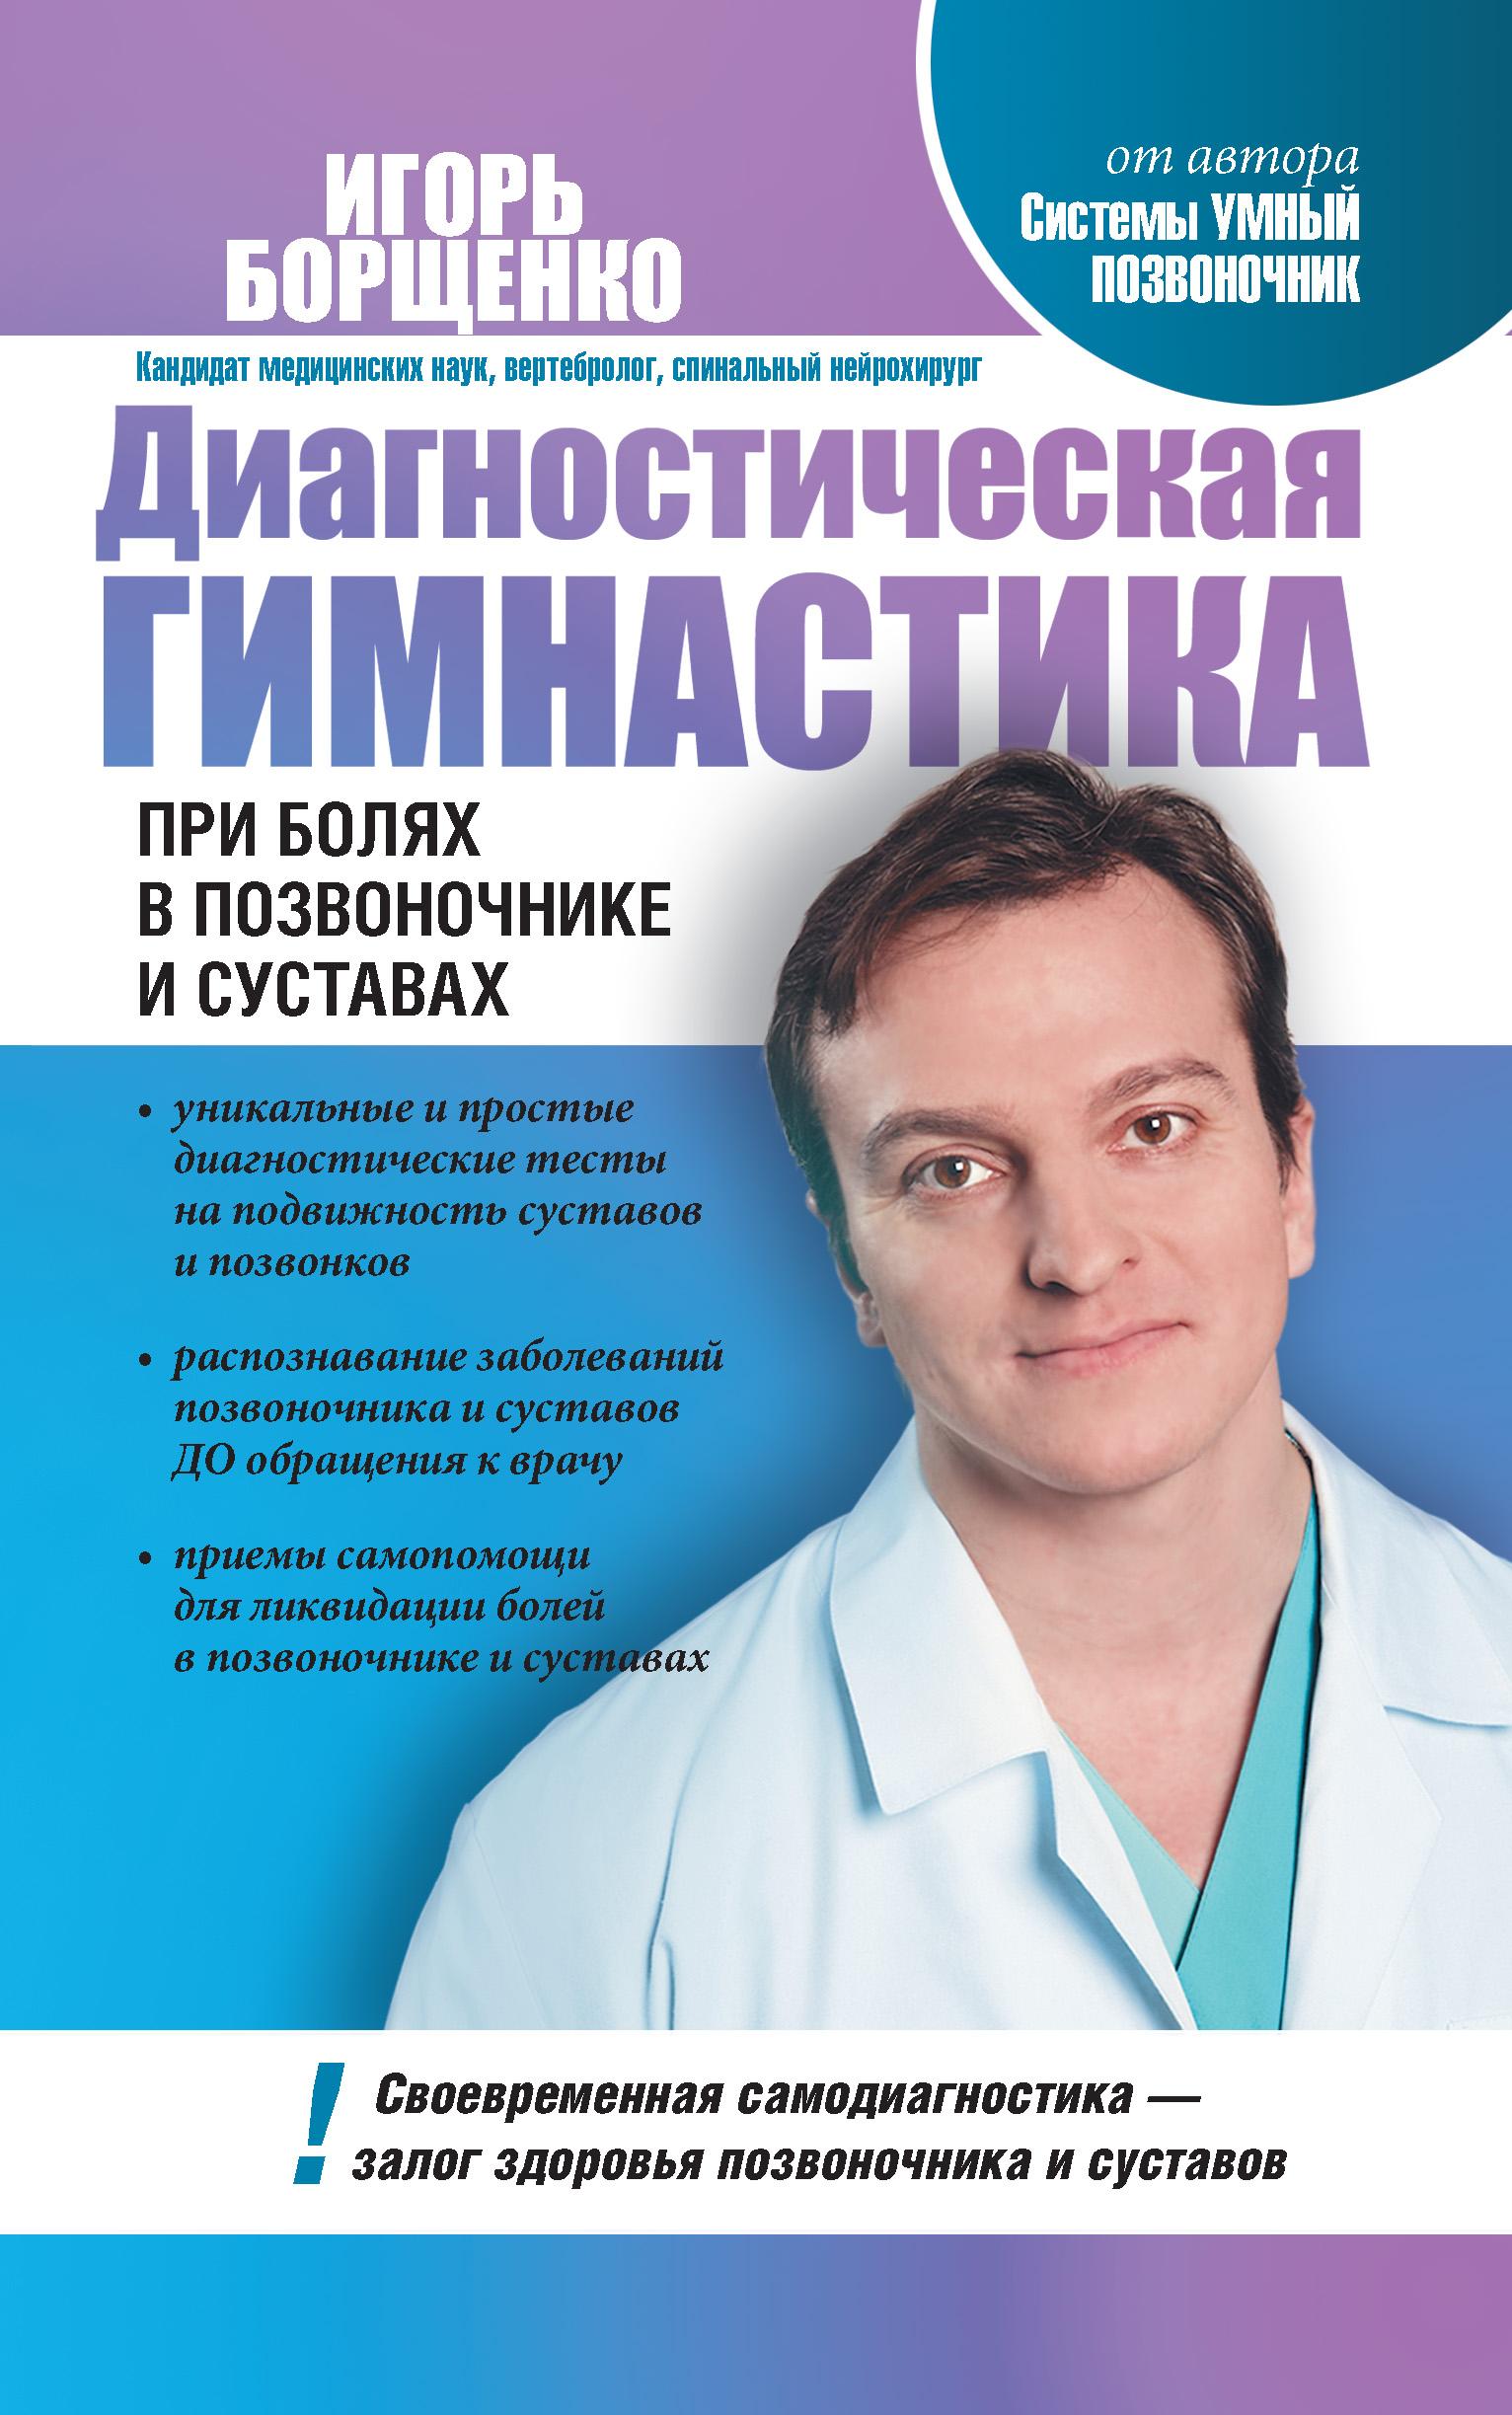 Reumatolog pavel evdokimenko gimnastica pentru artroza